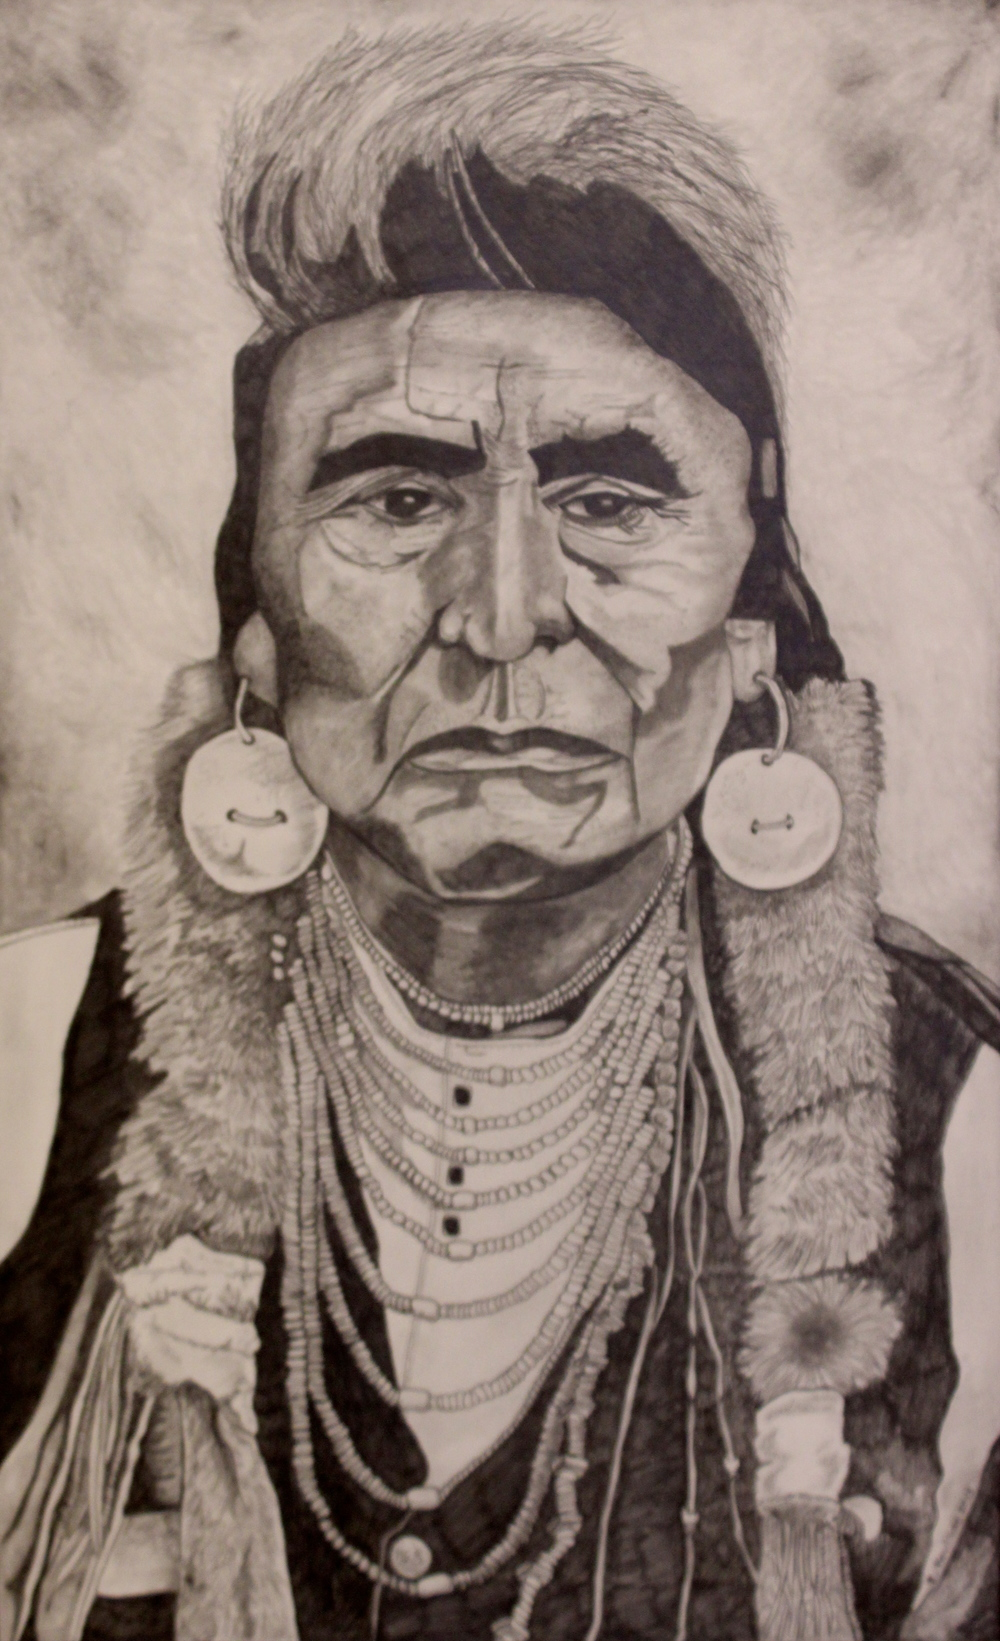 Chief Joseph by K. Houlihan